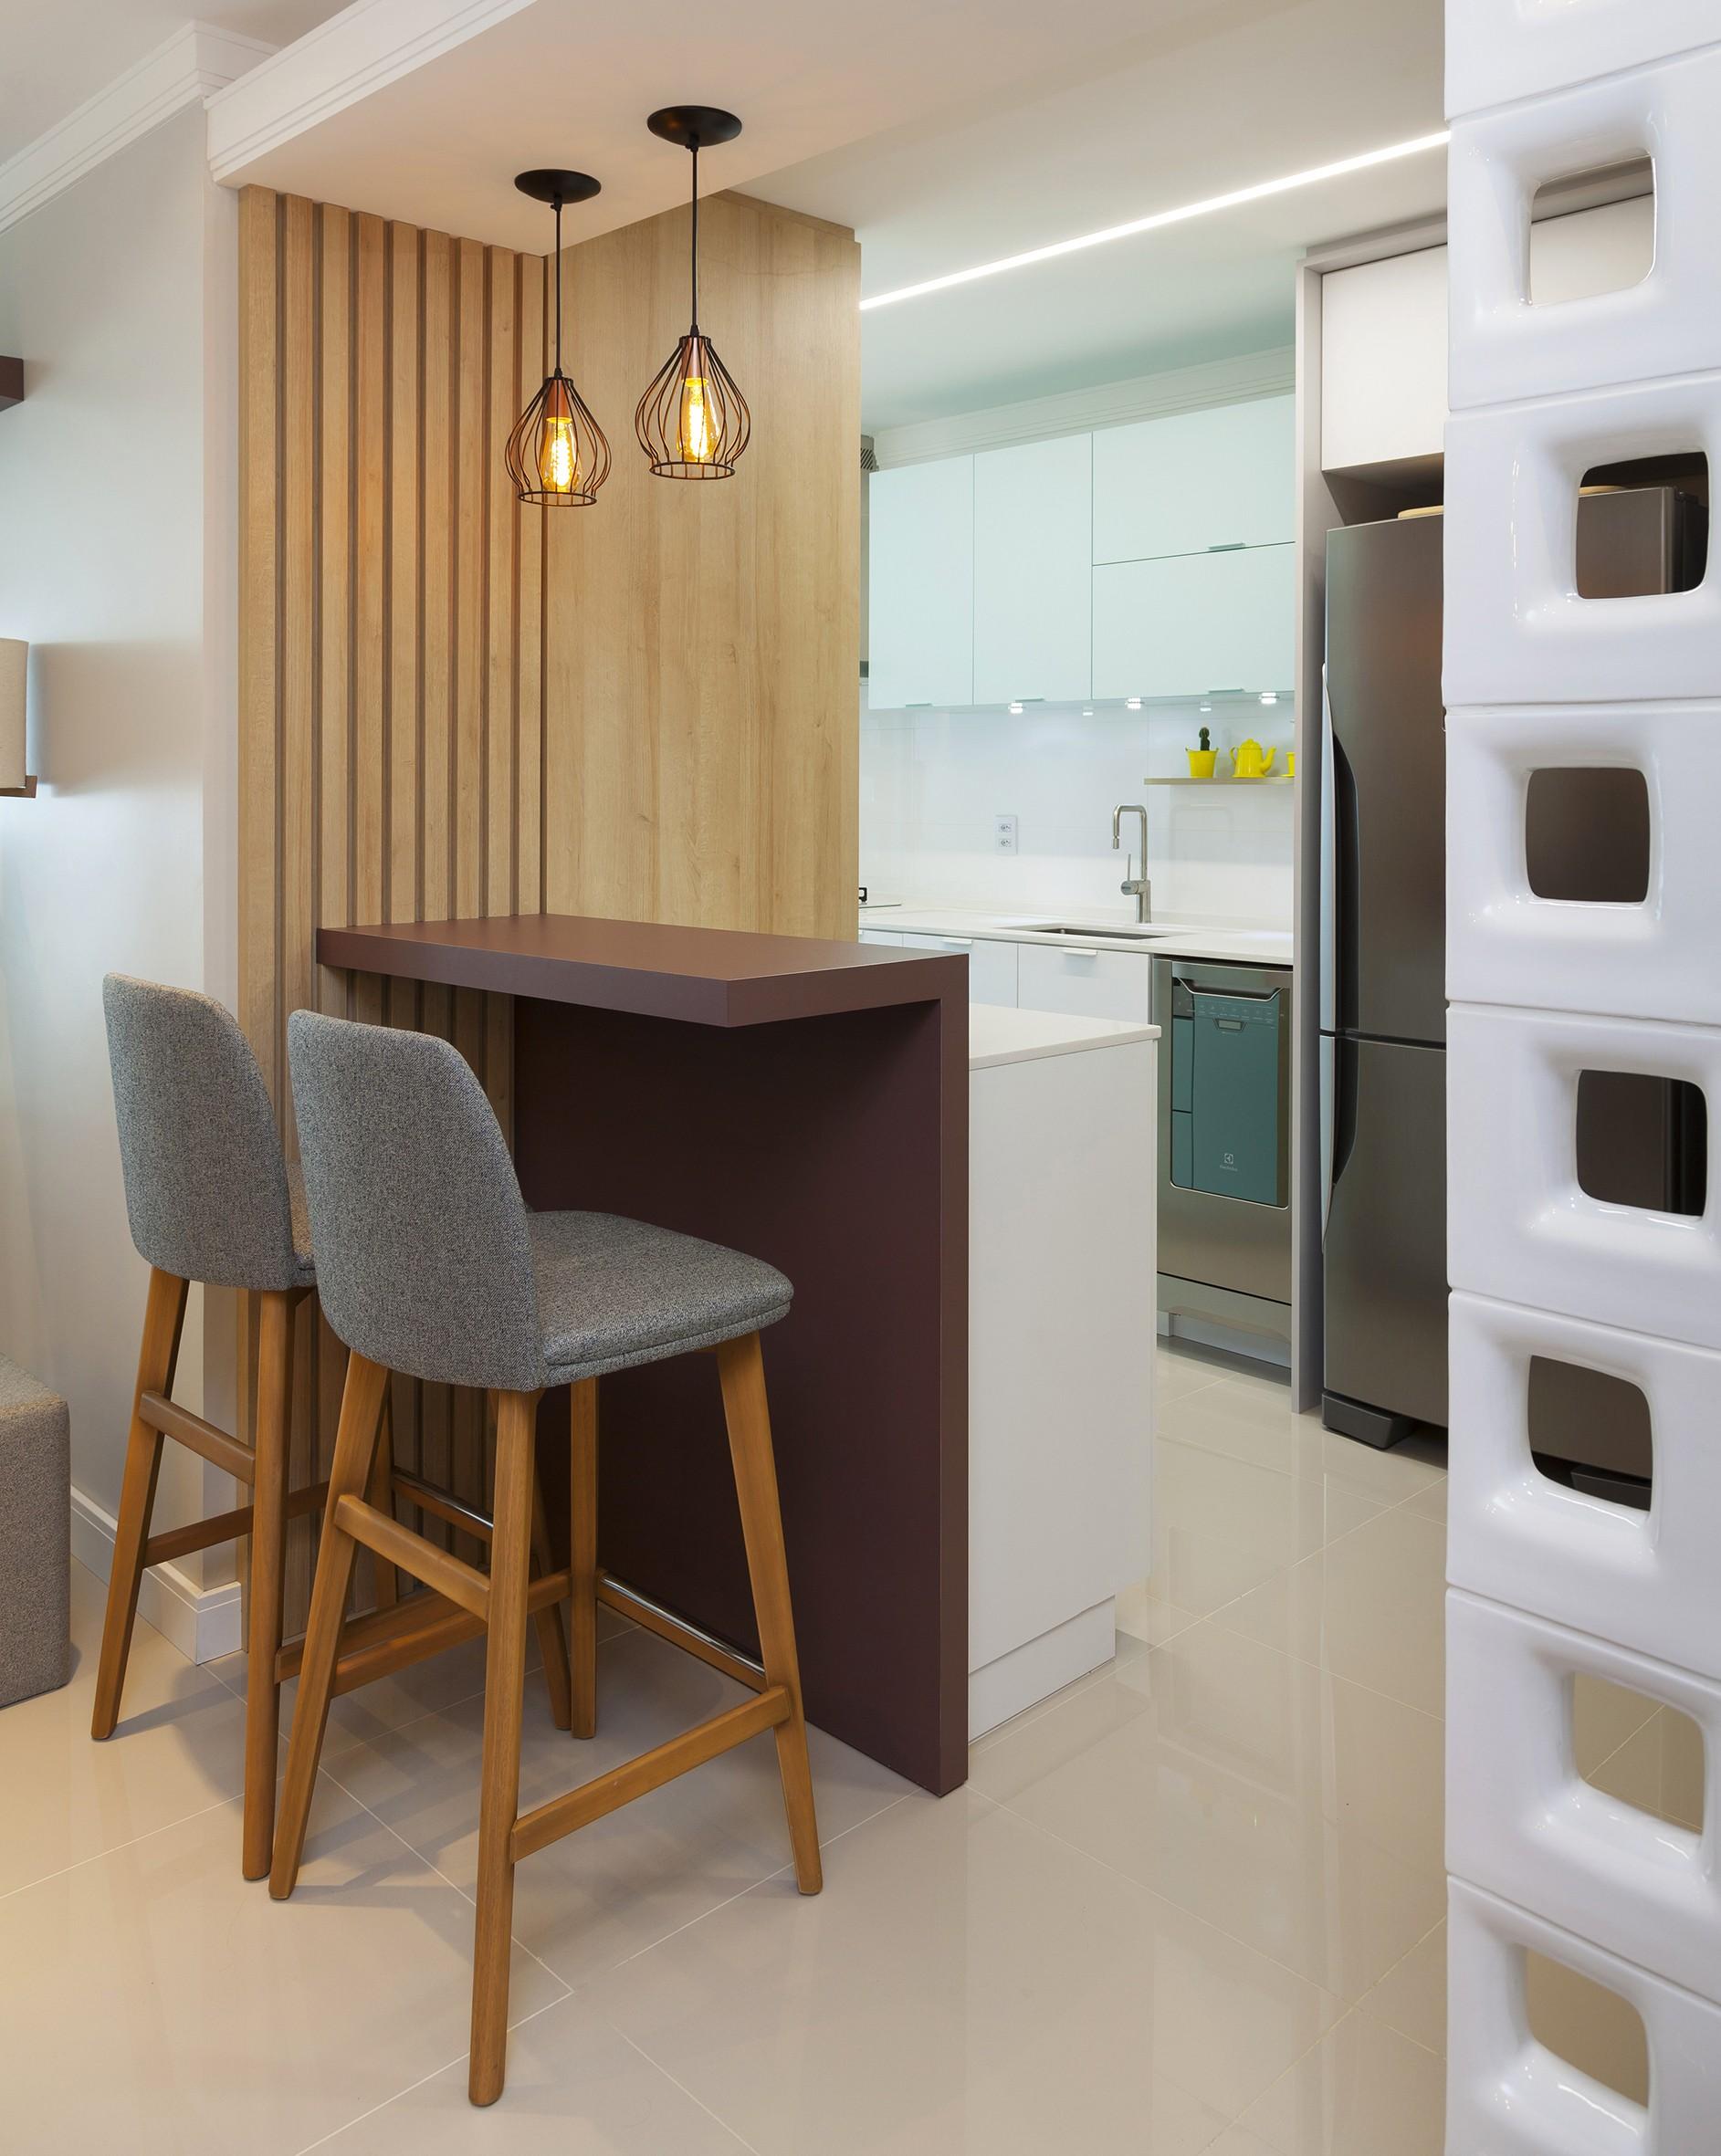 Cozinha MMZ-A84 STUDIO